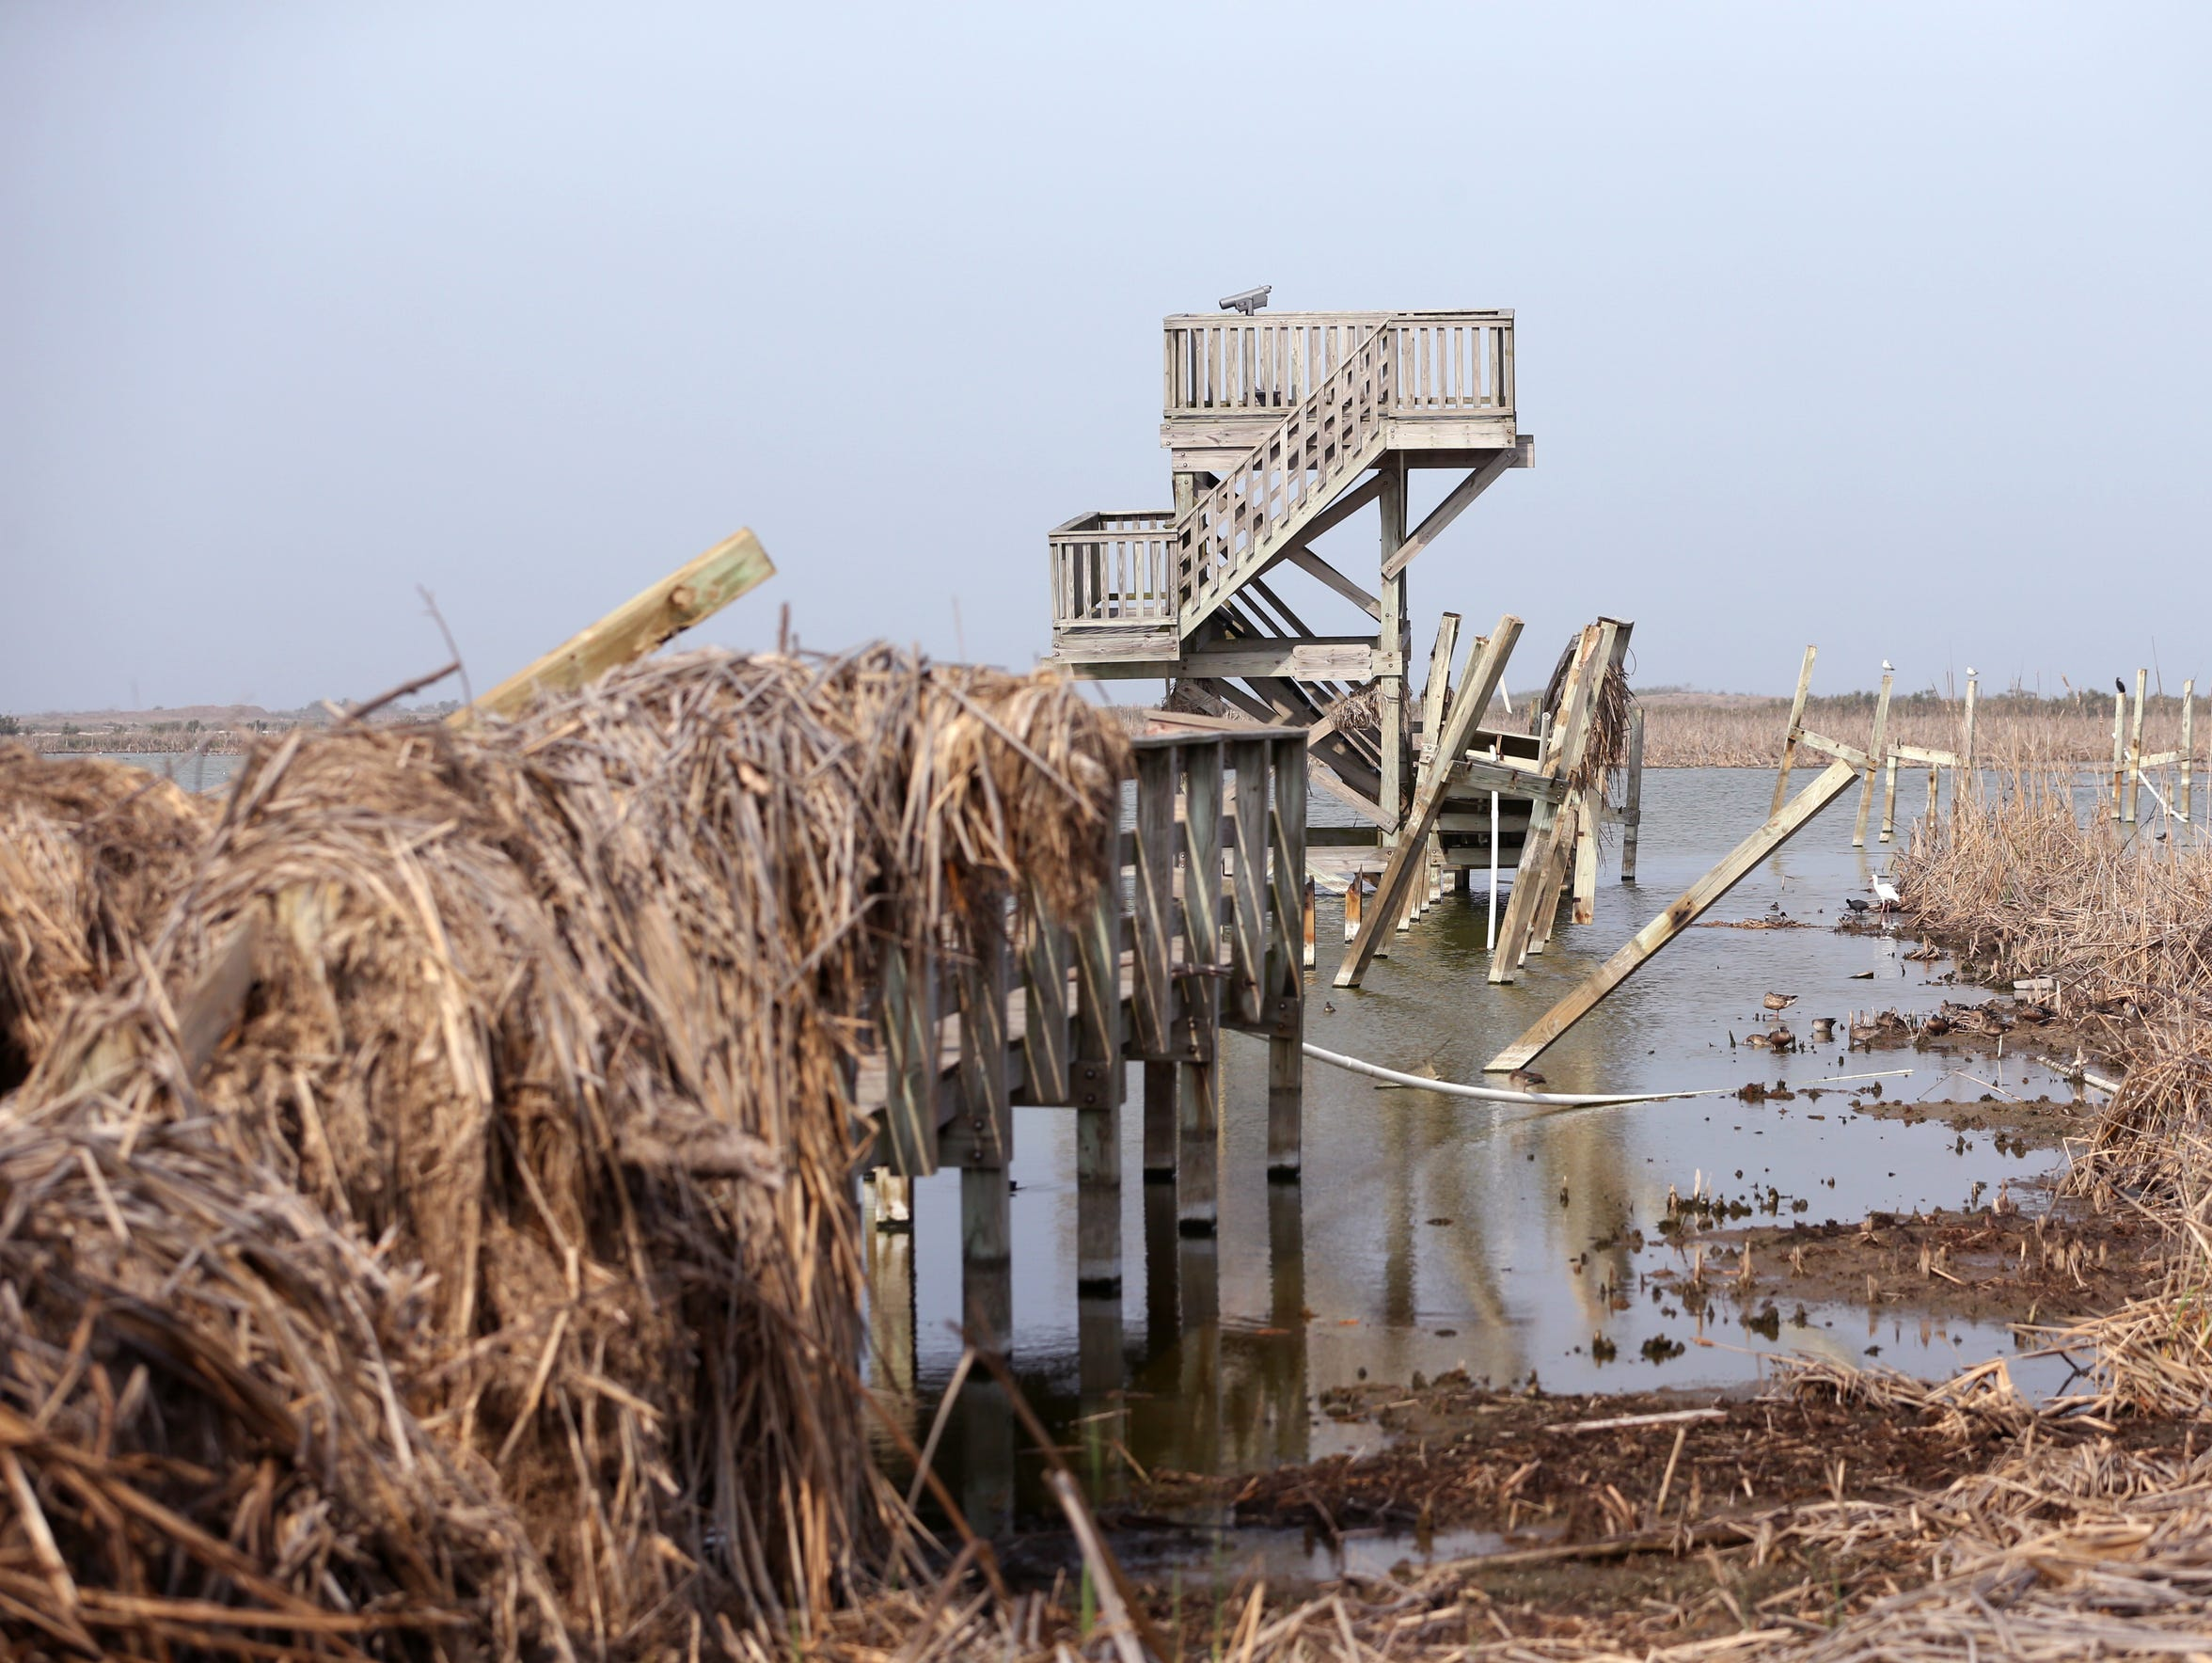 Six months after Hurricane Harvey hit Port Aransas,